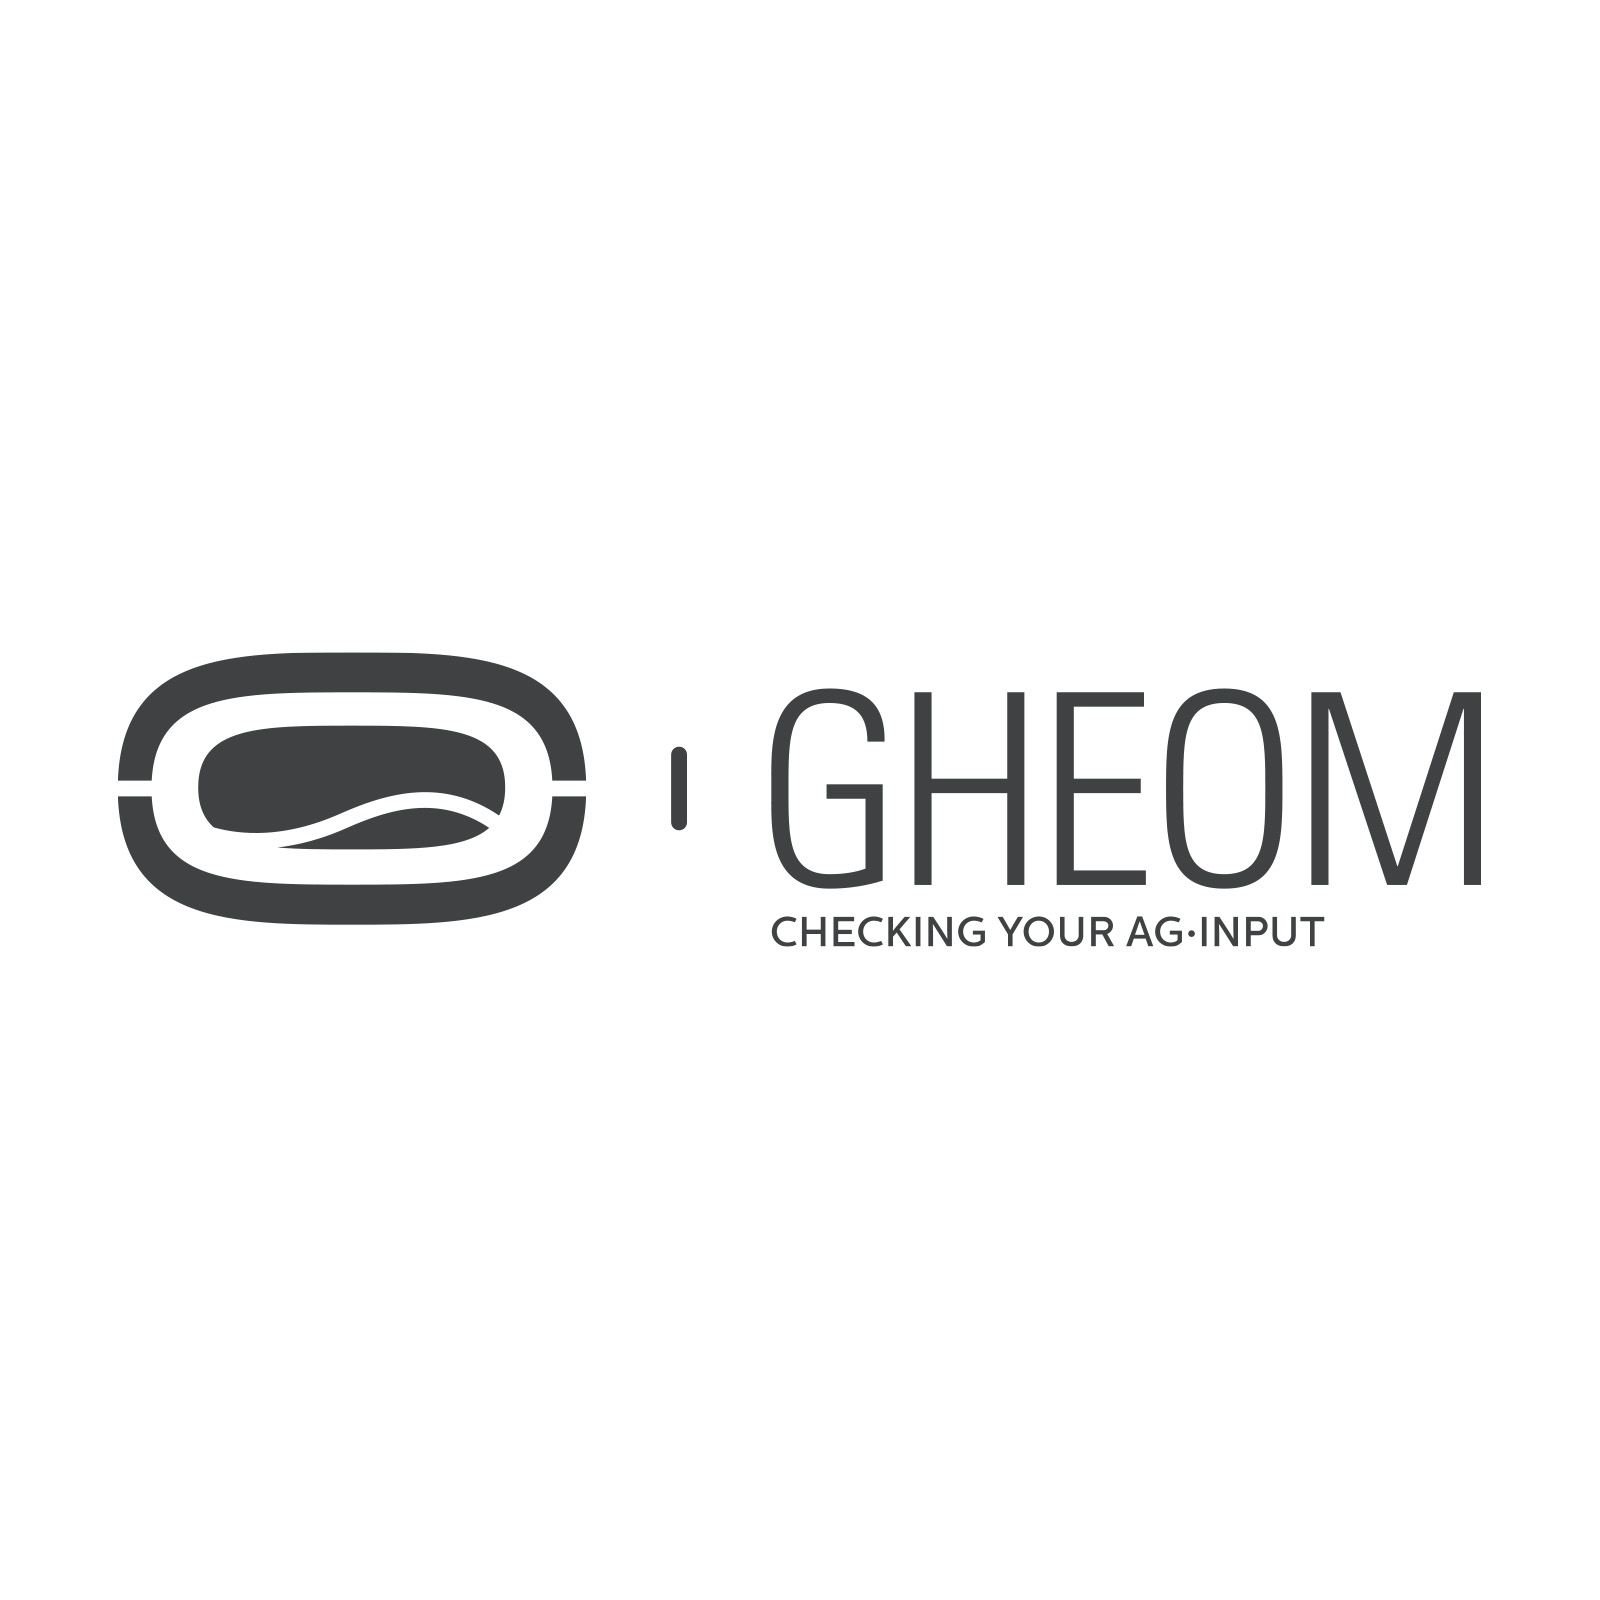 Gheom5.jpg